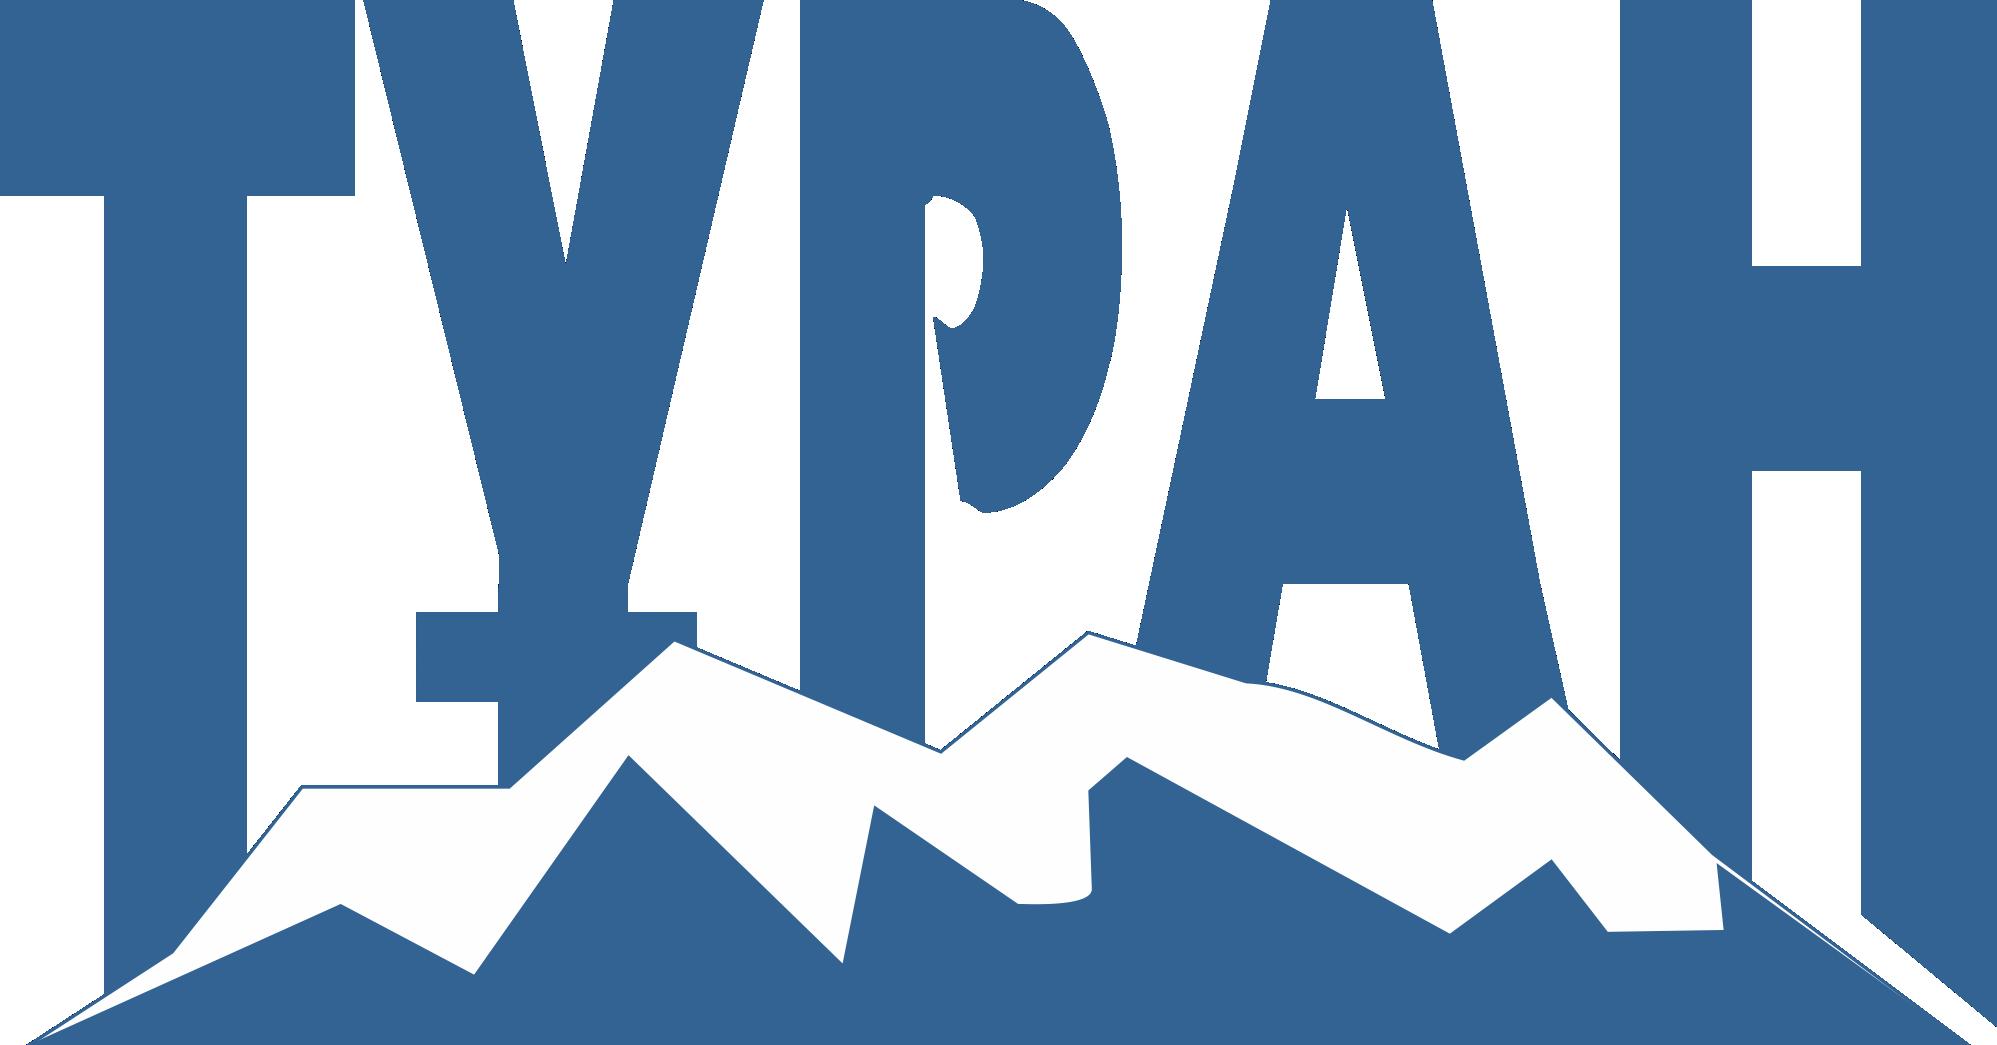 MBA — Мастер Бизнес Администрирования